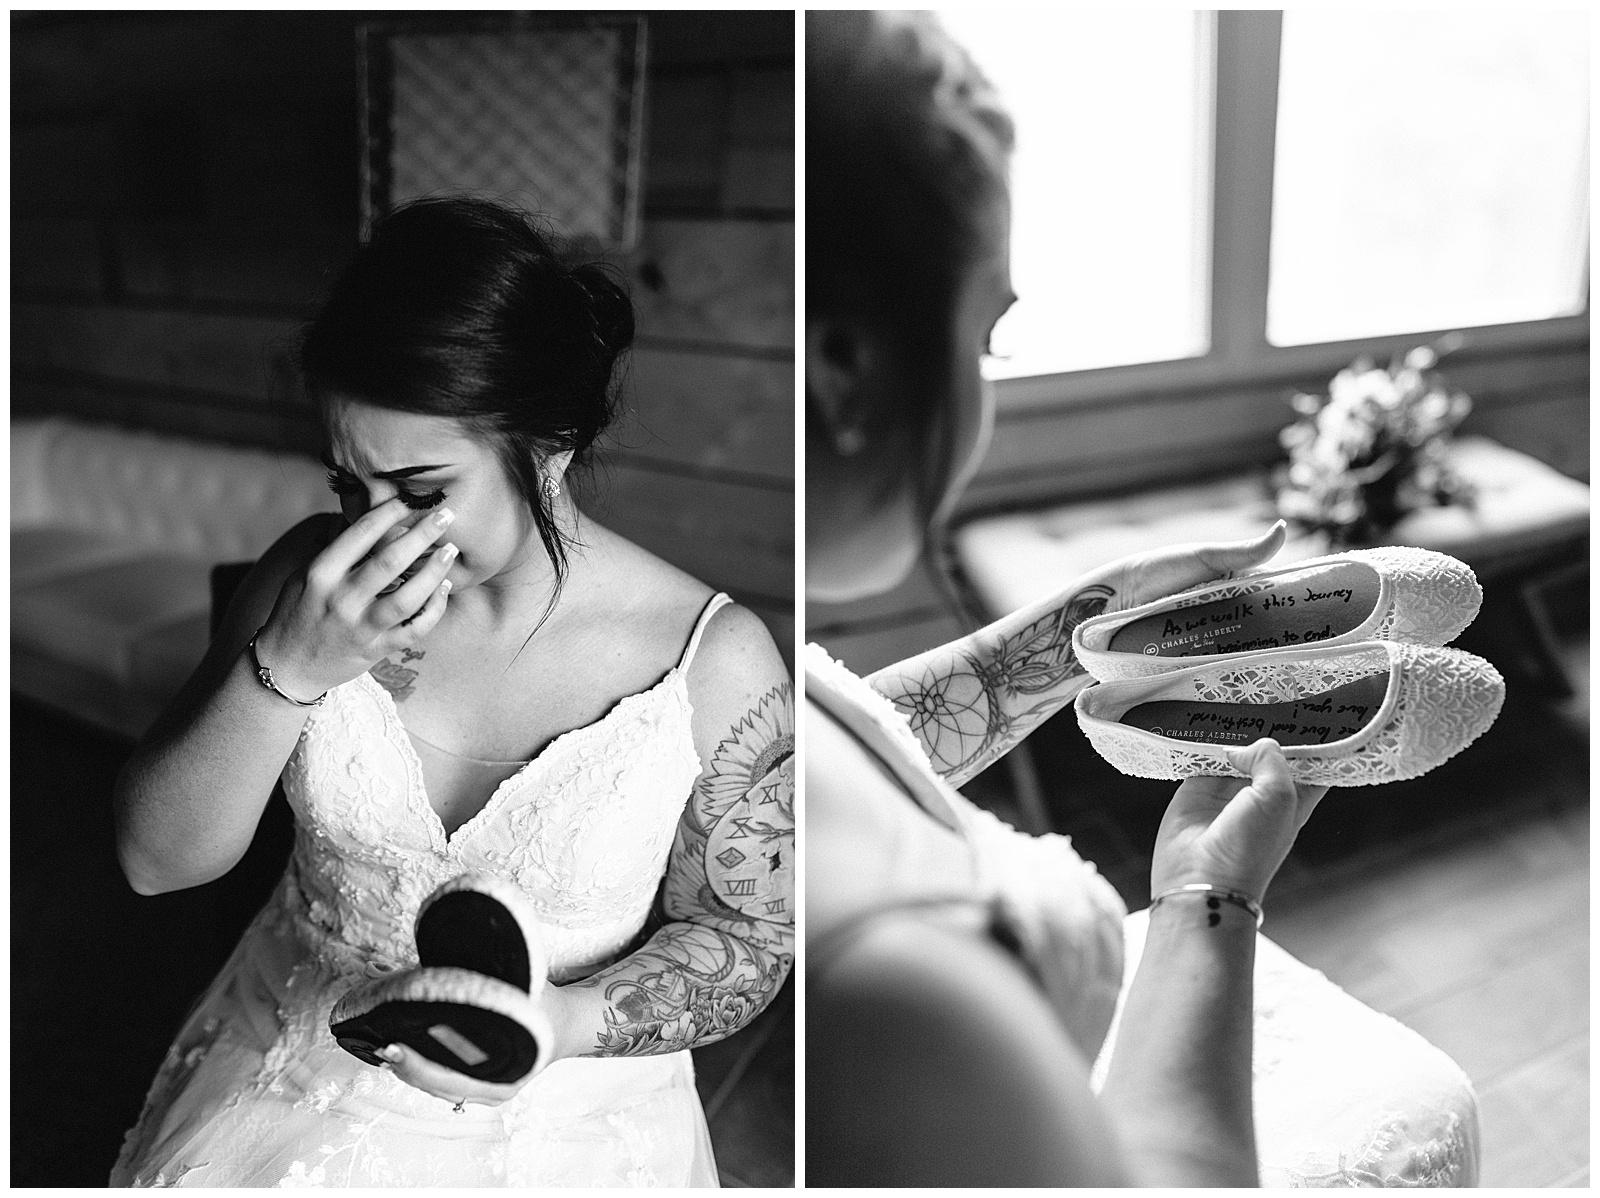 Lewis-Kara-Blakeman-Photography-Huntington-West-Virginia-Wedding-Barn-Olde-Homestea-16